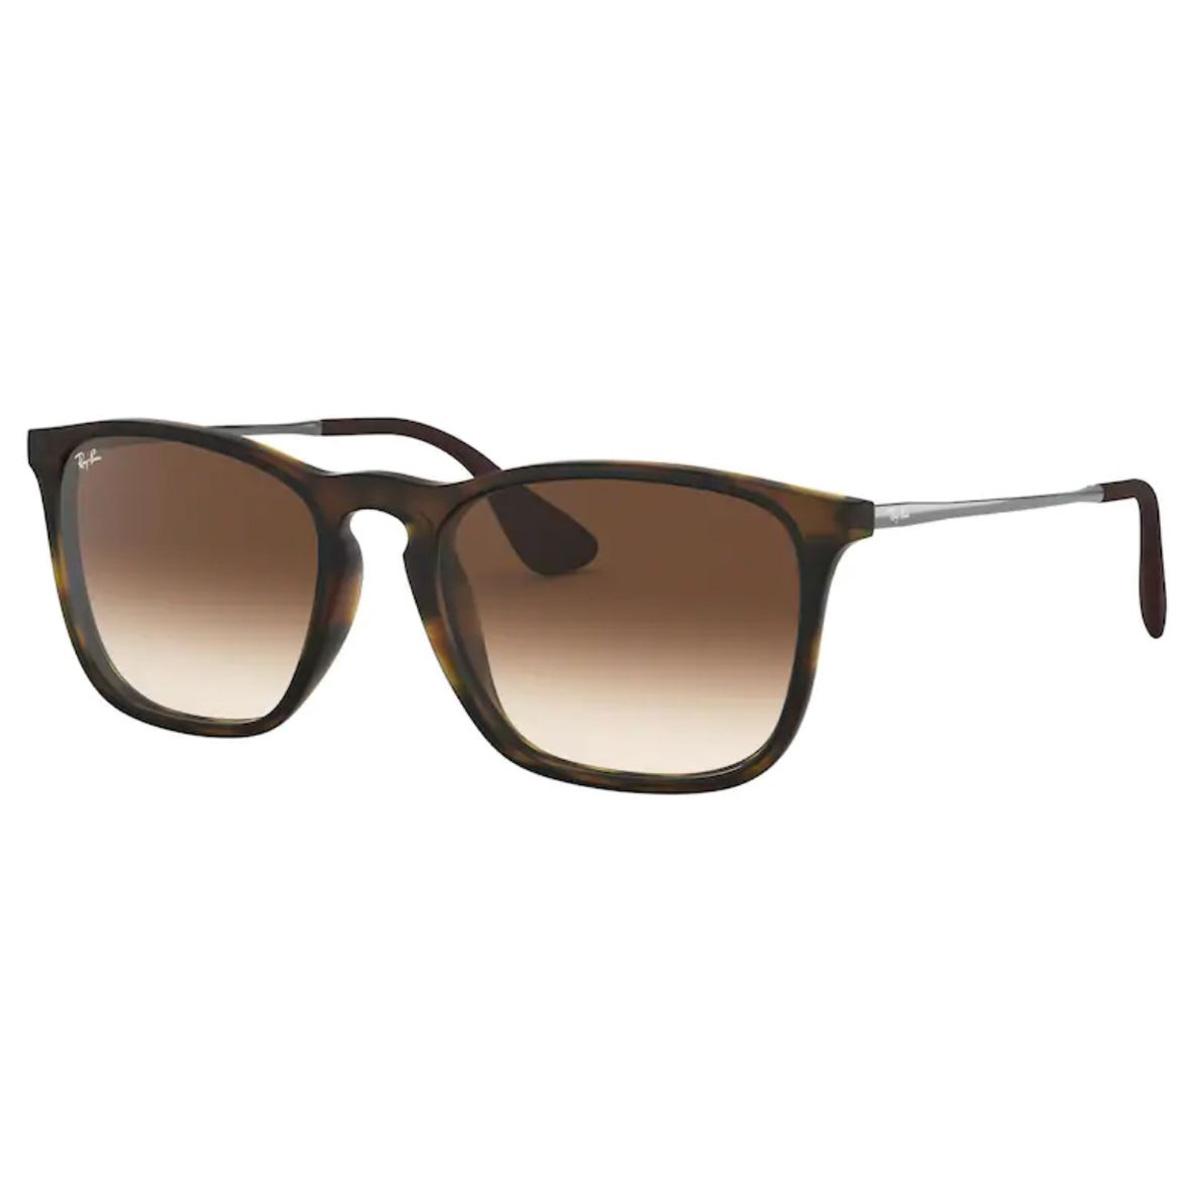 Óculos de Sol Chris RB4187L Marrom Havana Fosco